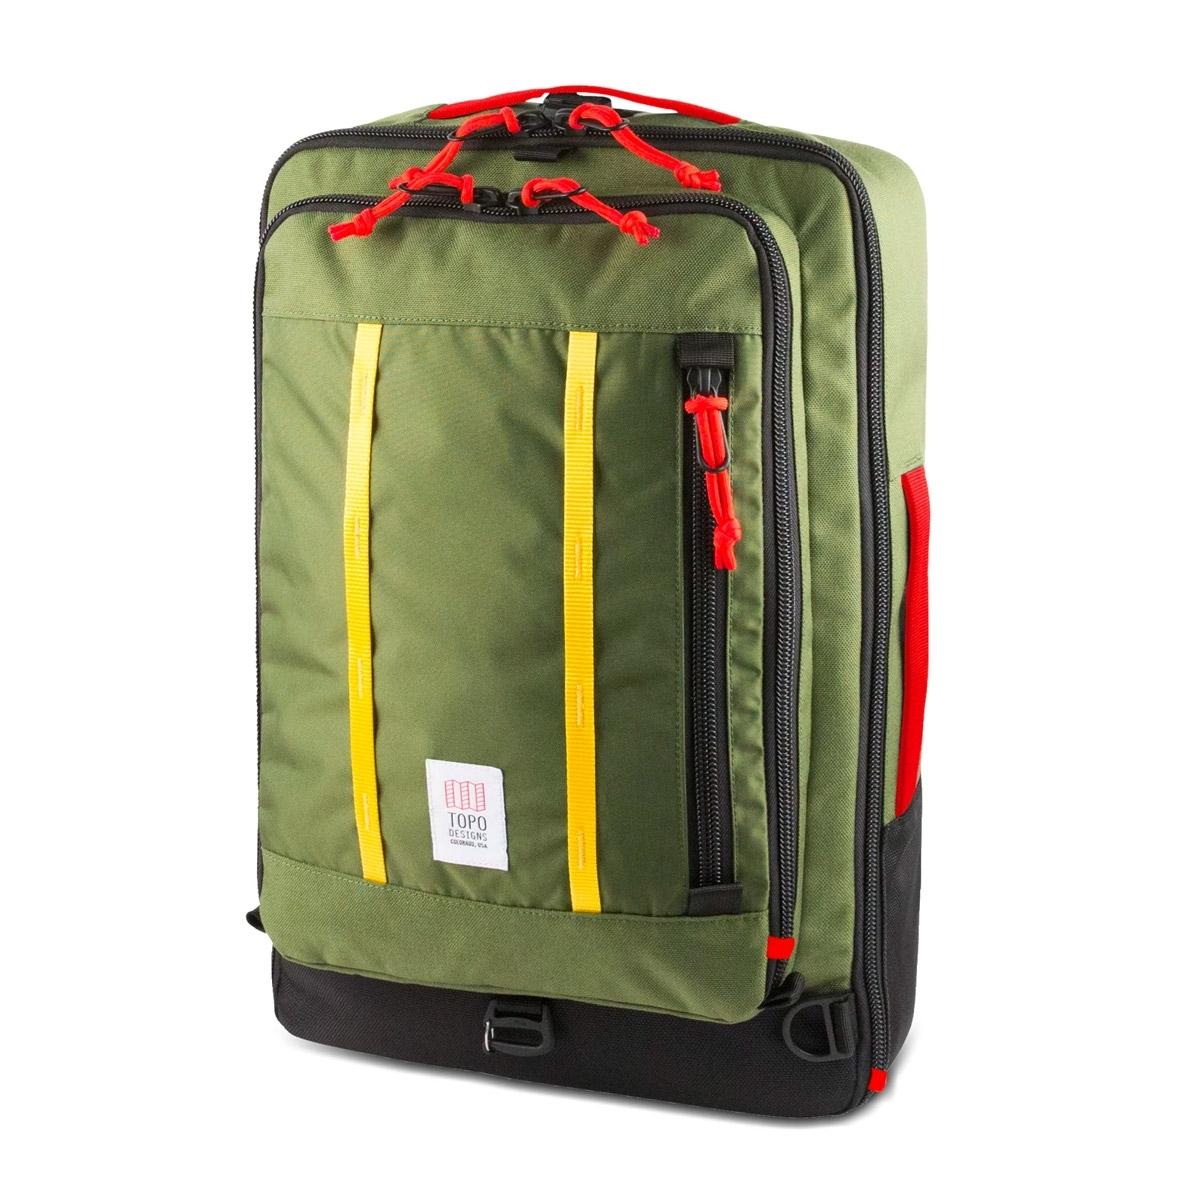 Topo Designs Travel Bag 30L Olive